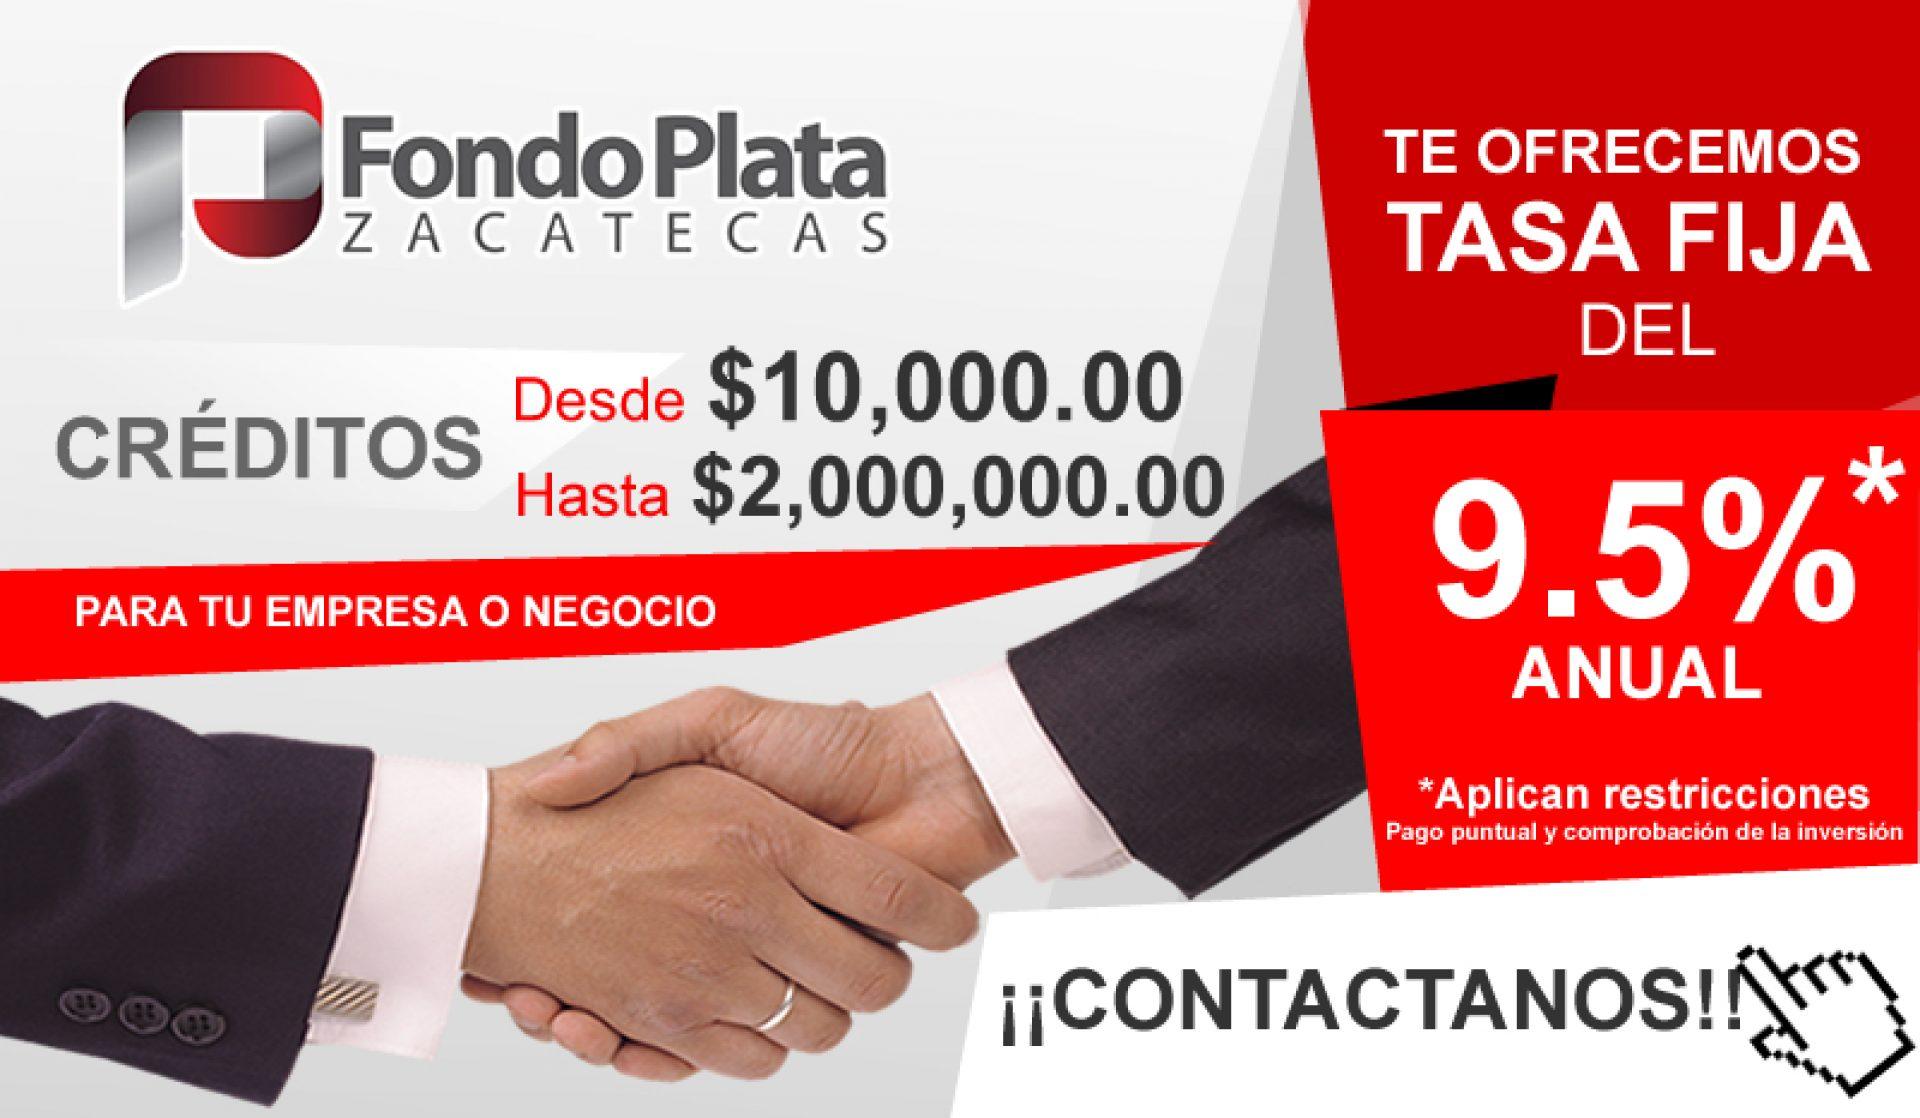 Fondo Plata Zacatecas